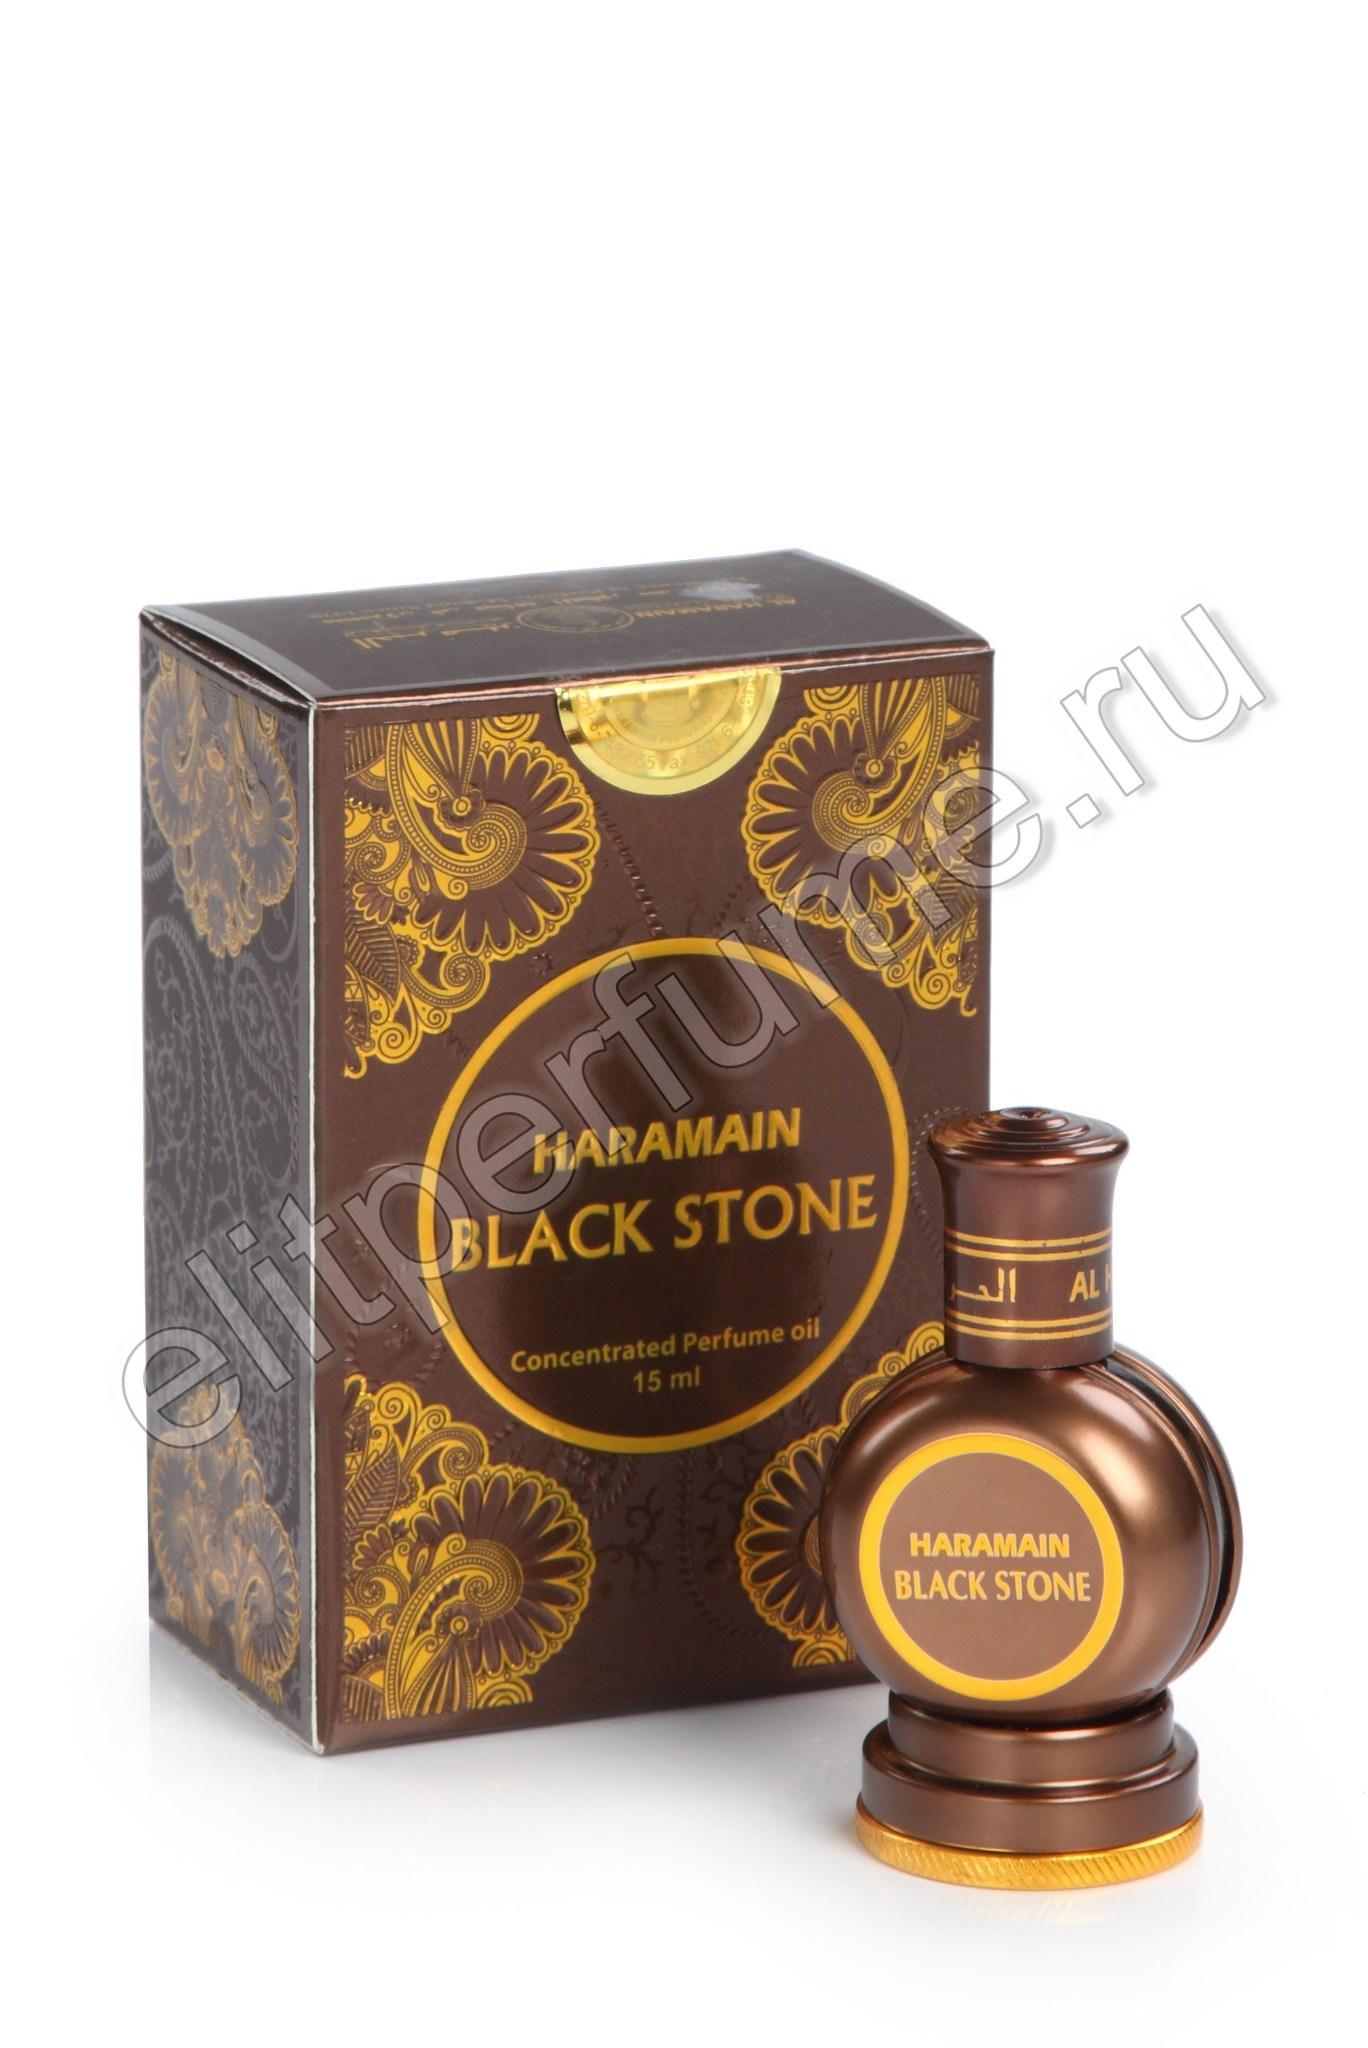 Пробники для духов Haramain Black Stone Харамайн Черный Камень 1 мл арабские масляные духи от Аль Харамайн Al Haramin Perfumes